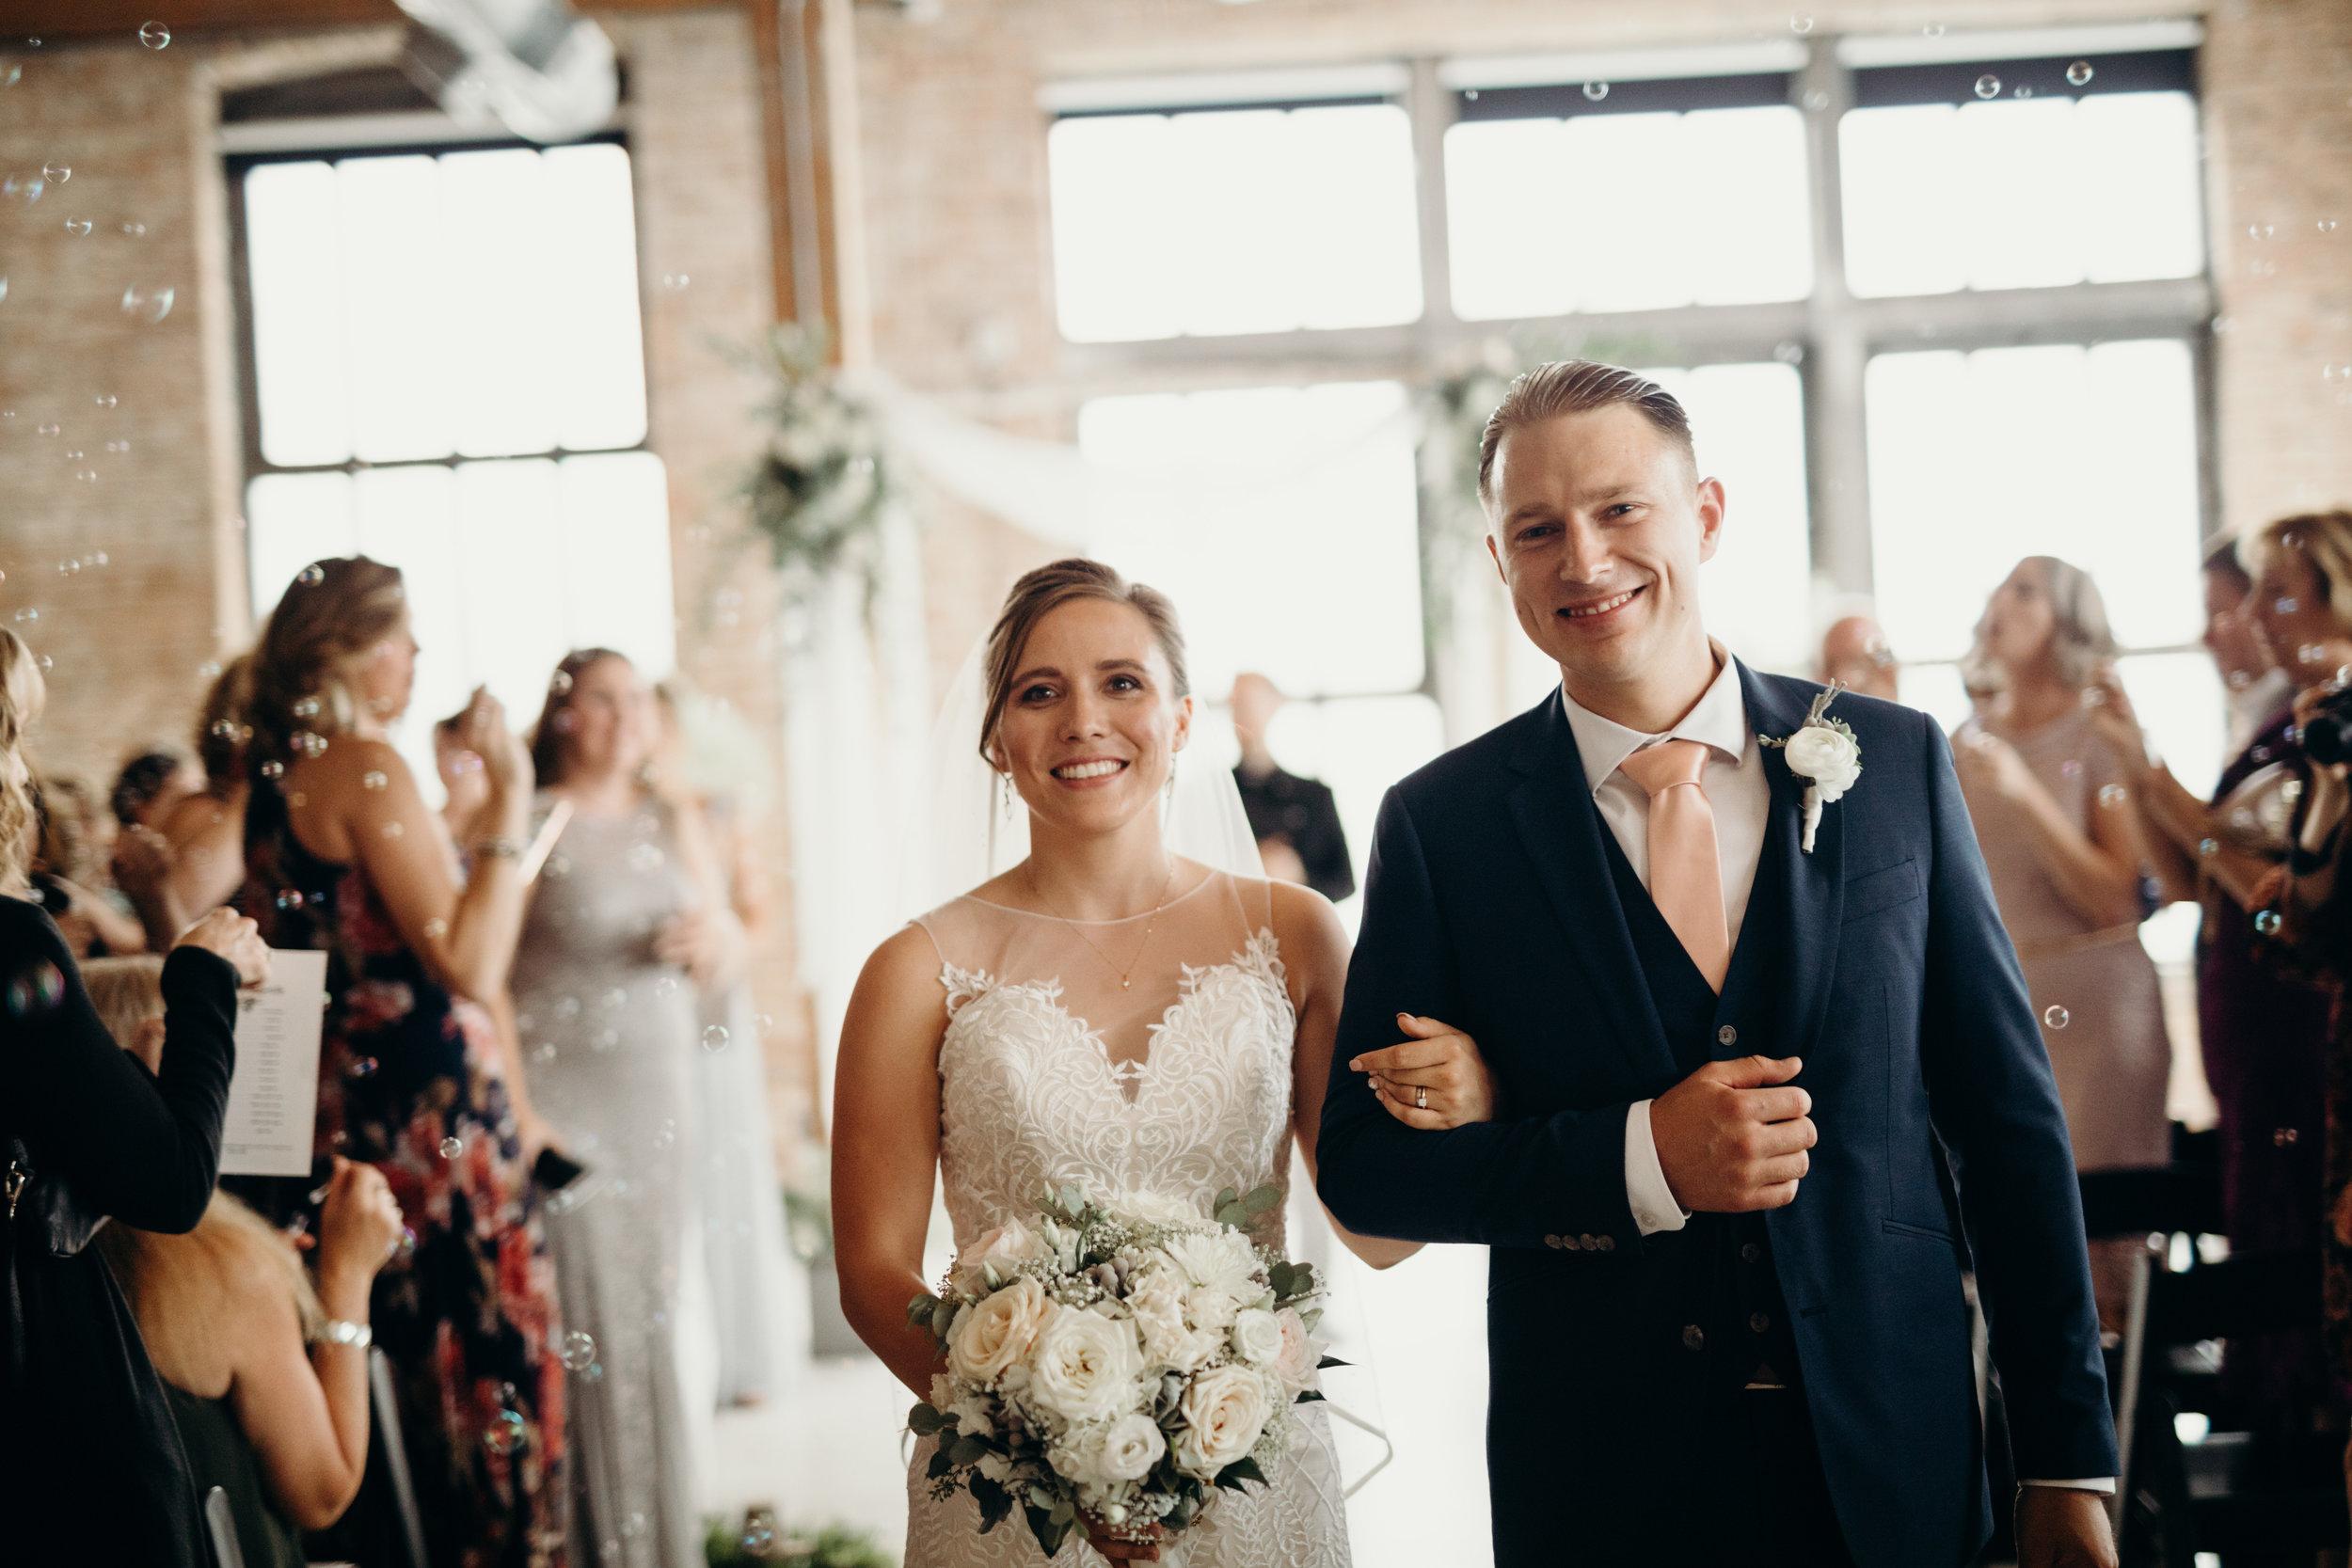 Vintage Wedding_Polly C Photography_20171726172134.jpg